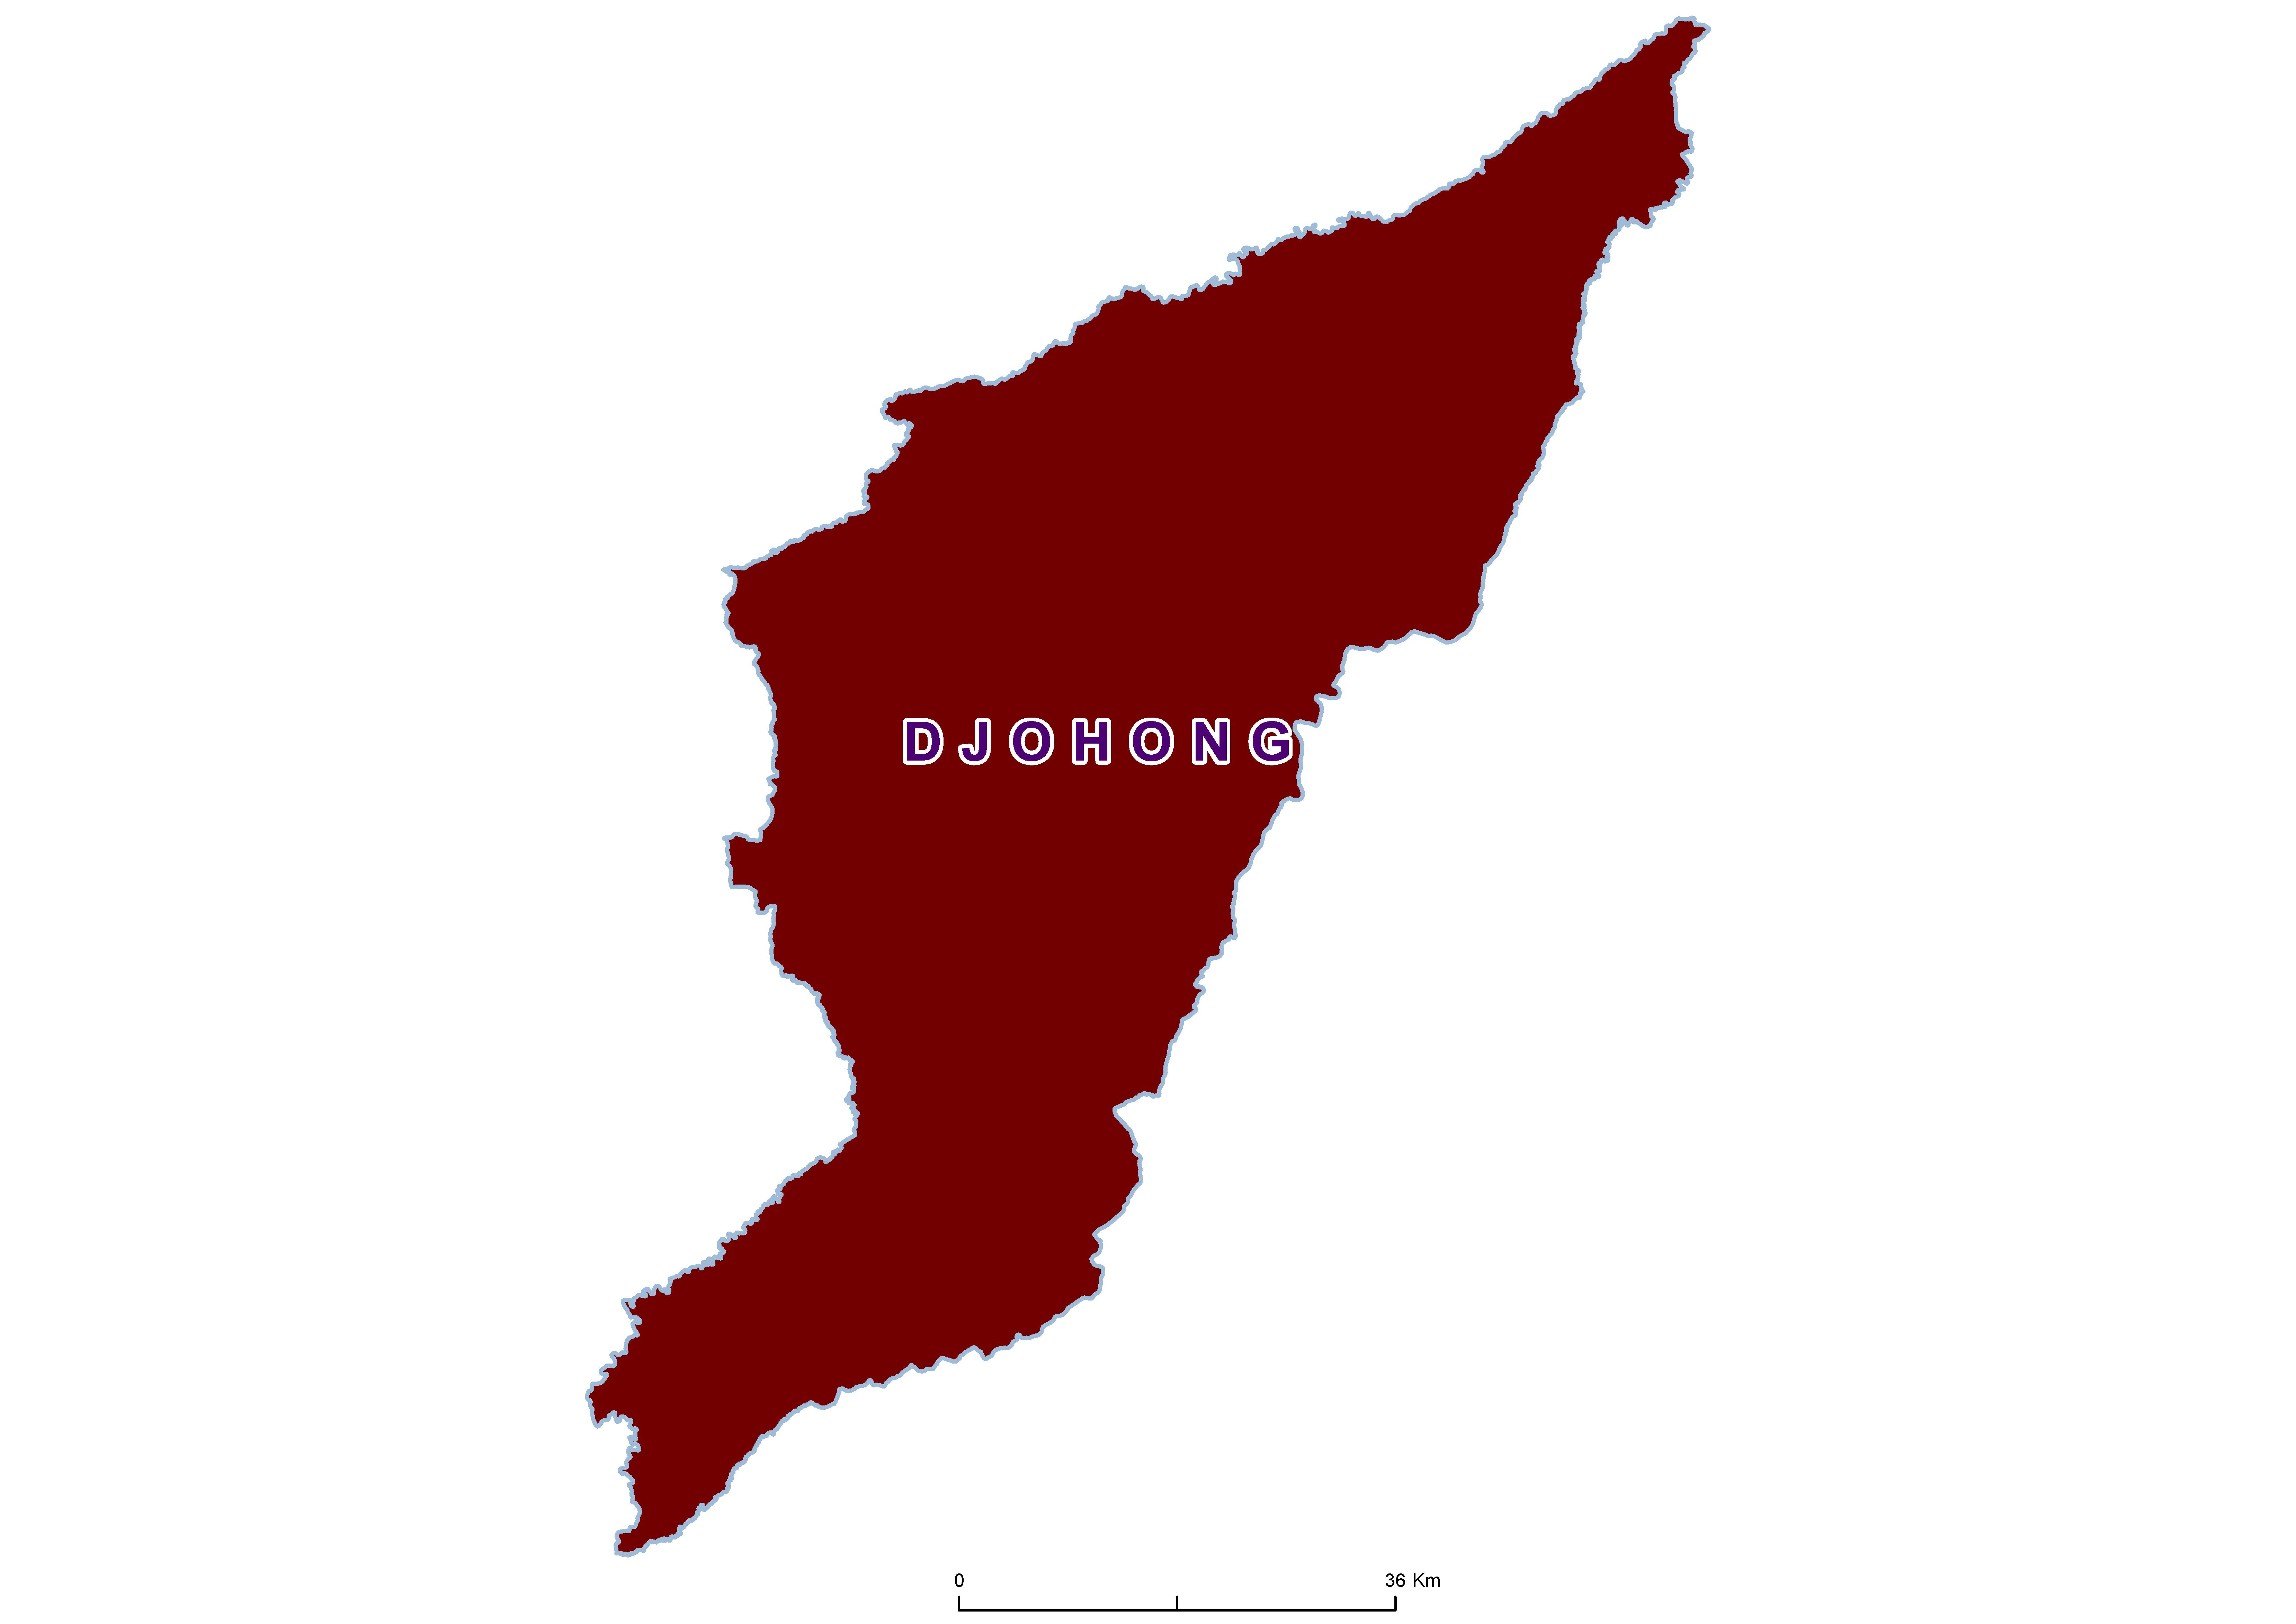 Djohong Mean STH 19850001